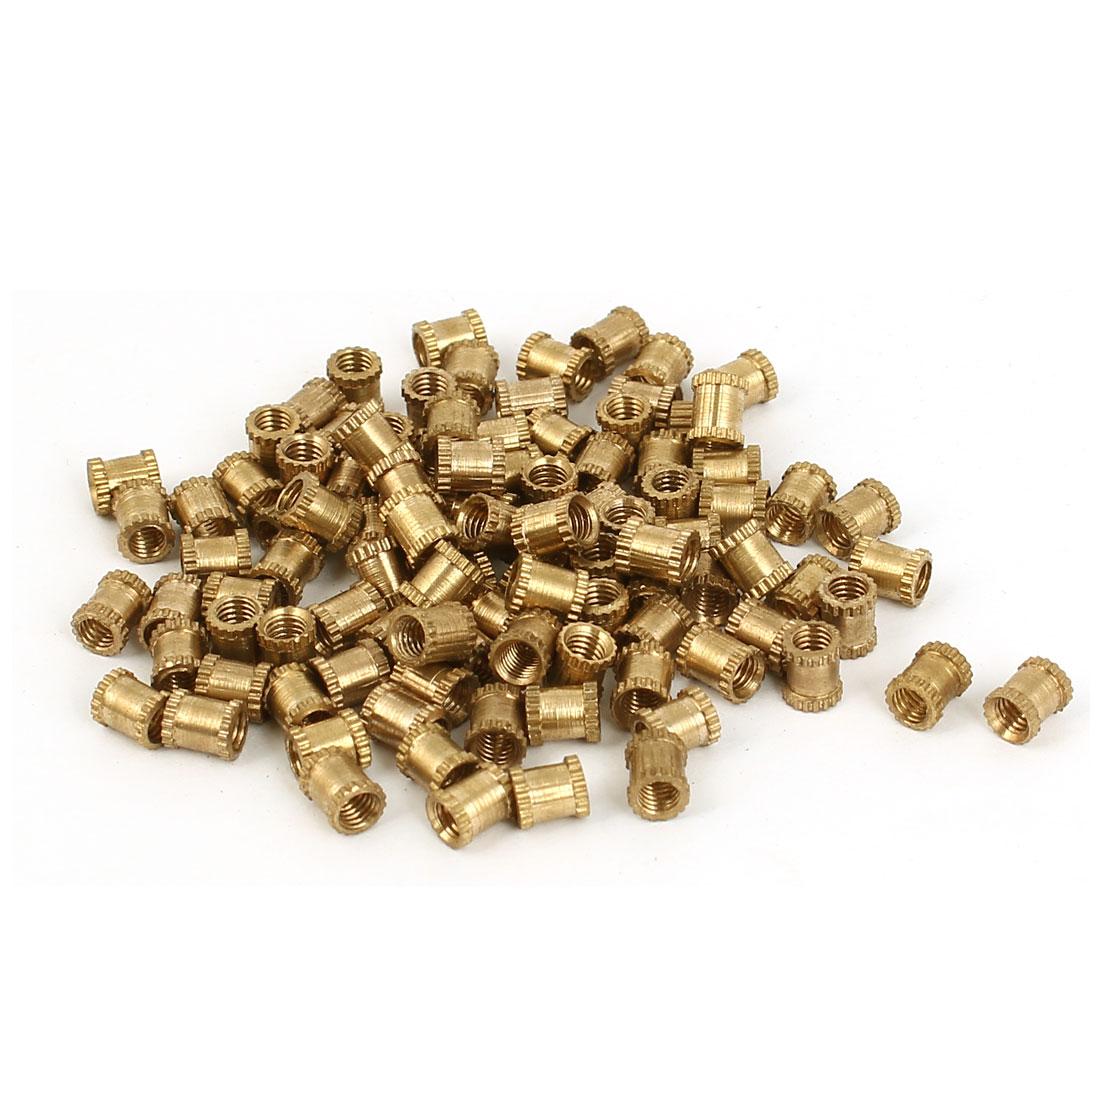 M3 x 4mm x 5mm Female Threaded Insert Embedded Brass Knurled Nut Fastener 100pcs